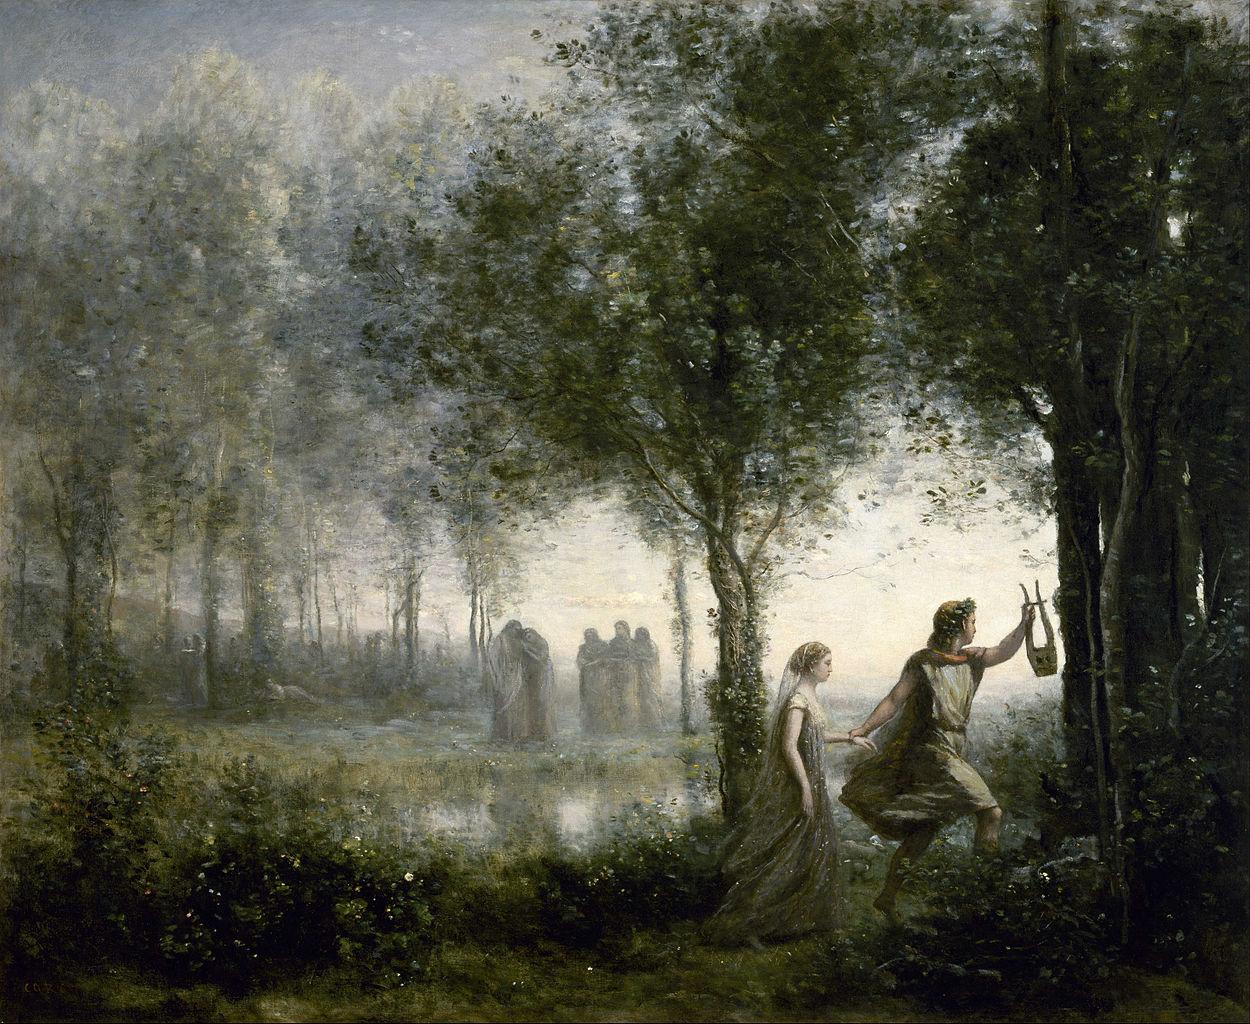 Камиль Коро - Орфей, ведущий Эвридику из царства теней (англ - Orpheus Leading Eurydice from the Underworld),1861